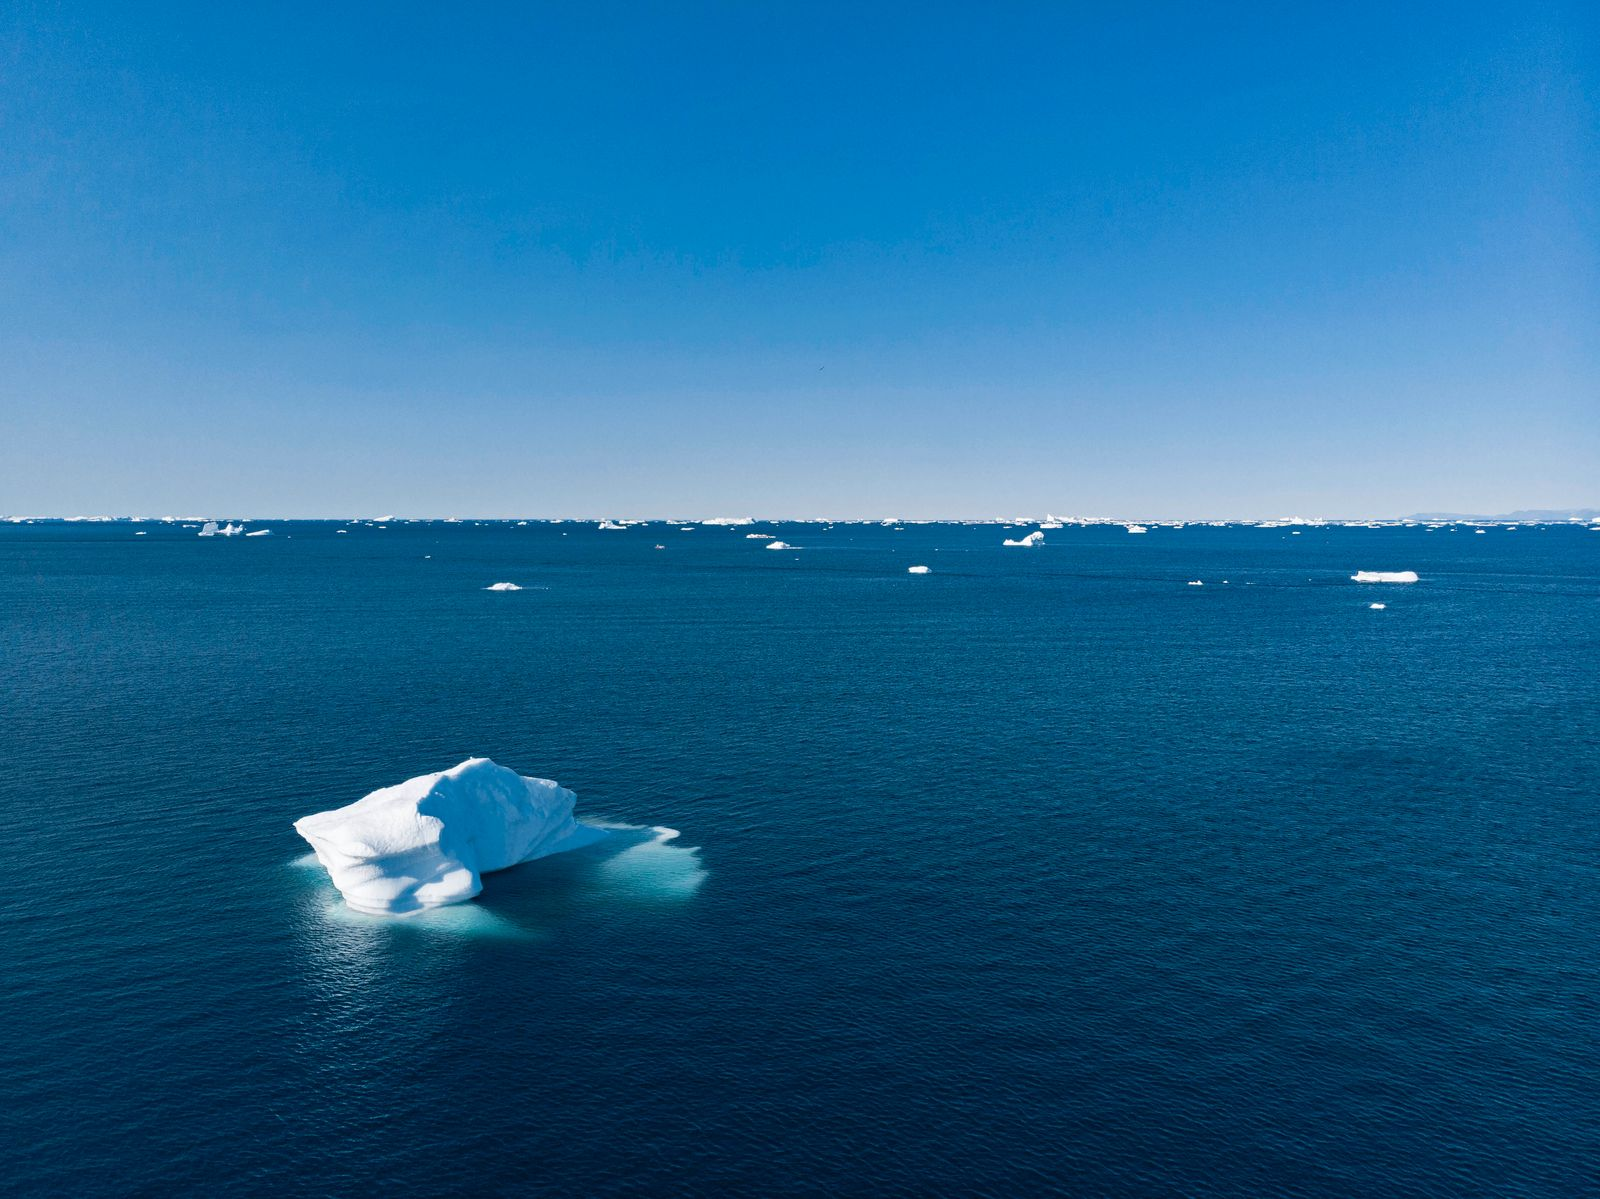 Polar ice melting on vast blue Atlantic Ocean Greenland Polar ice melting on sunny vast blue Atlantic Ocean Greenland. *